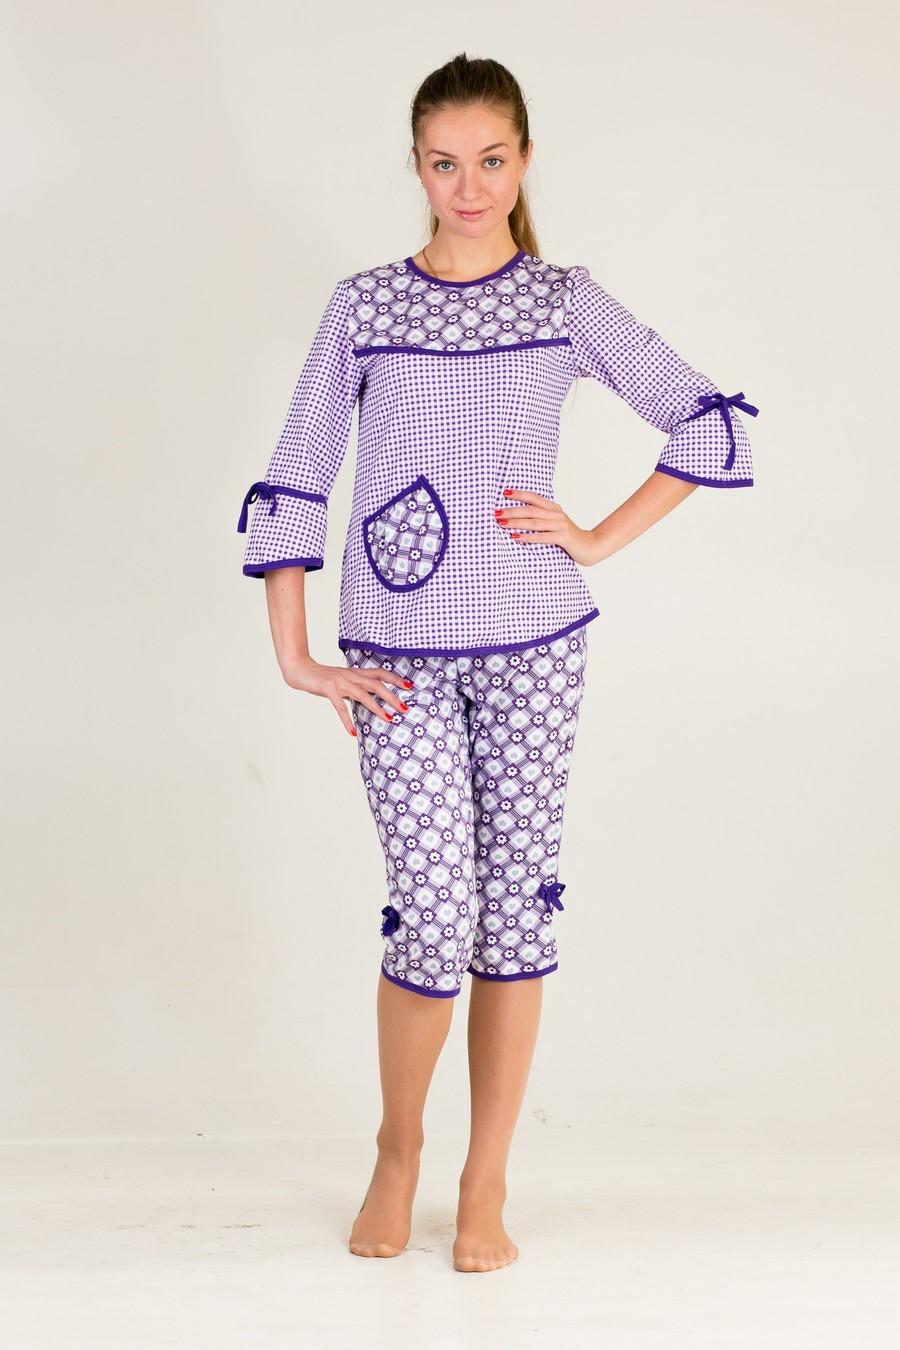 Пижама Катя Фиолет кофта+бриджиДомашняя одежда<br><br><br>Размер: 52